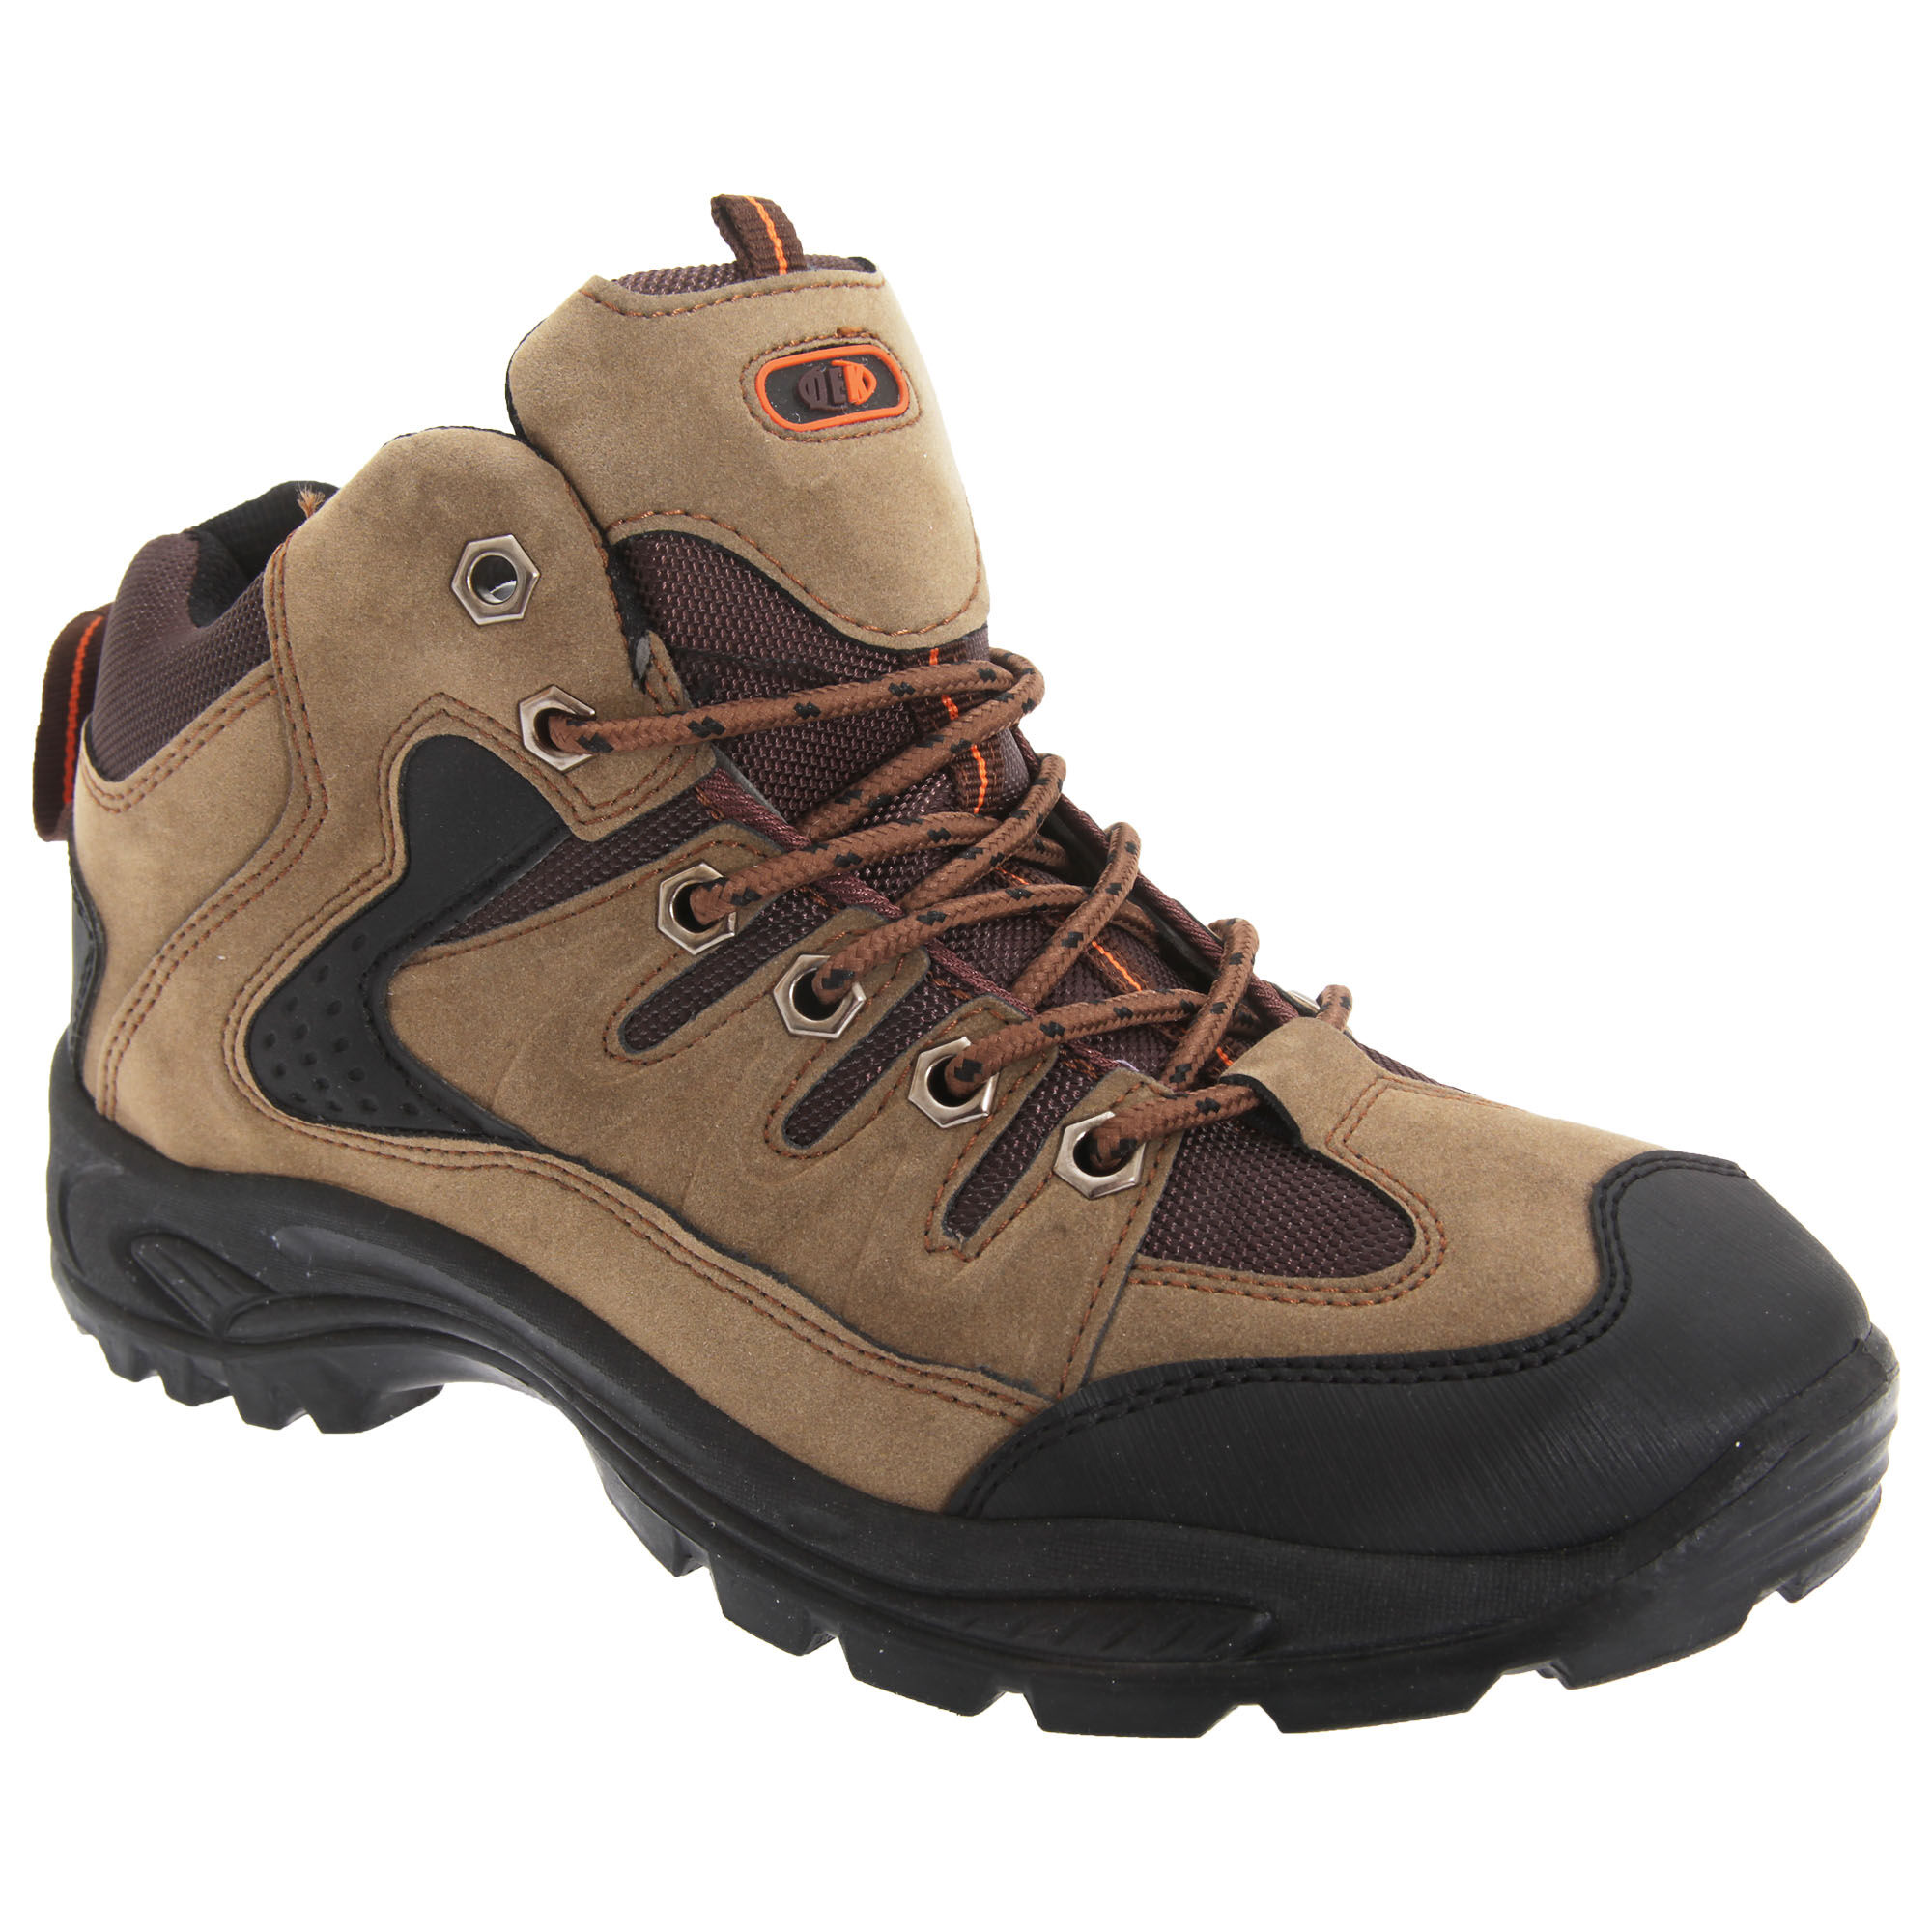 Dek Ontario - Chaussures De Randonnée - Homme (Kaki) (43 EUR) - UTDF141